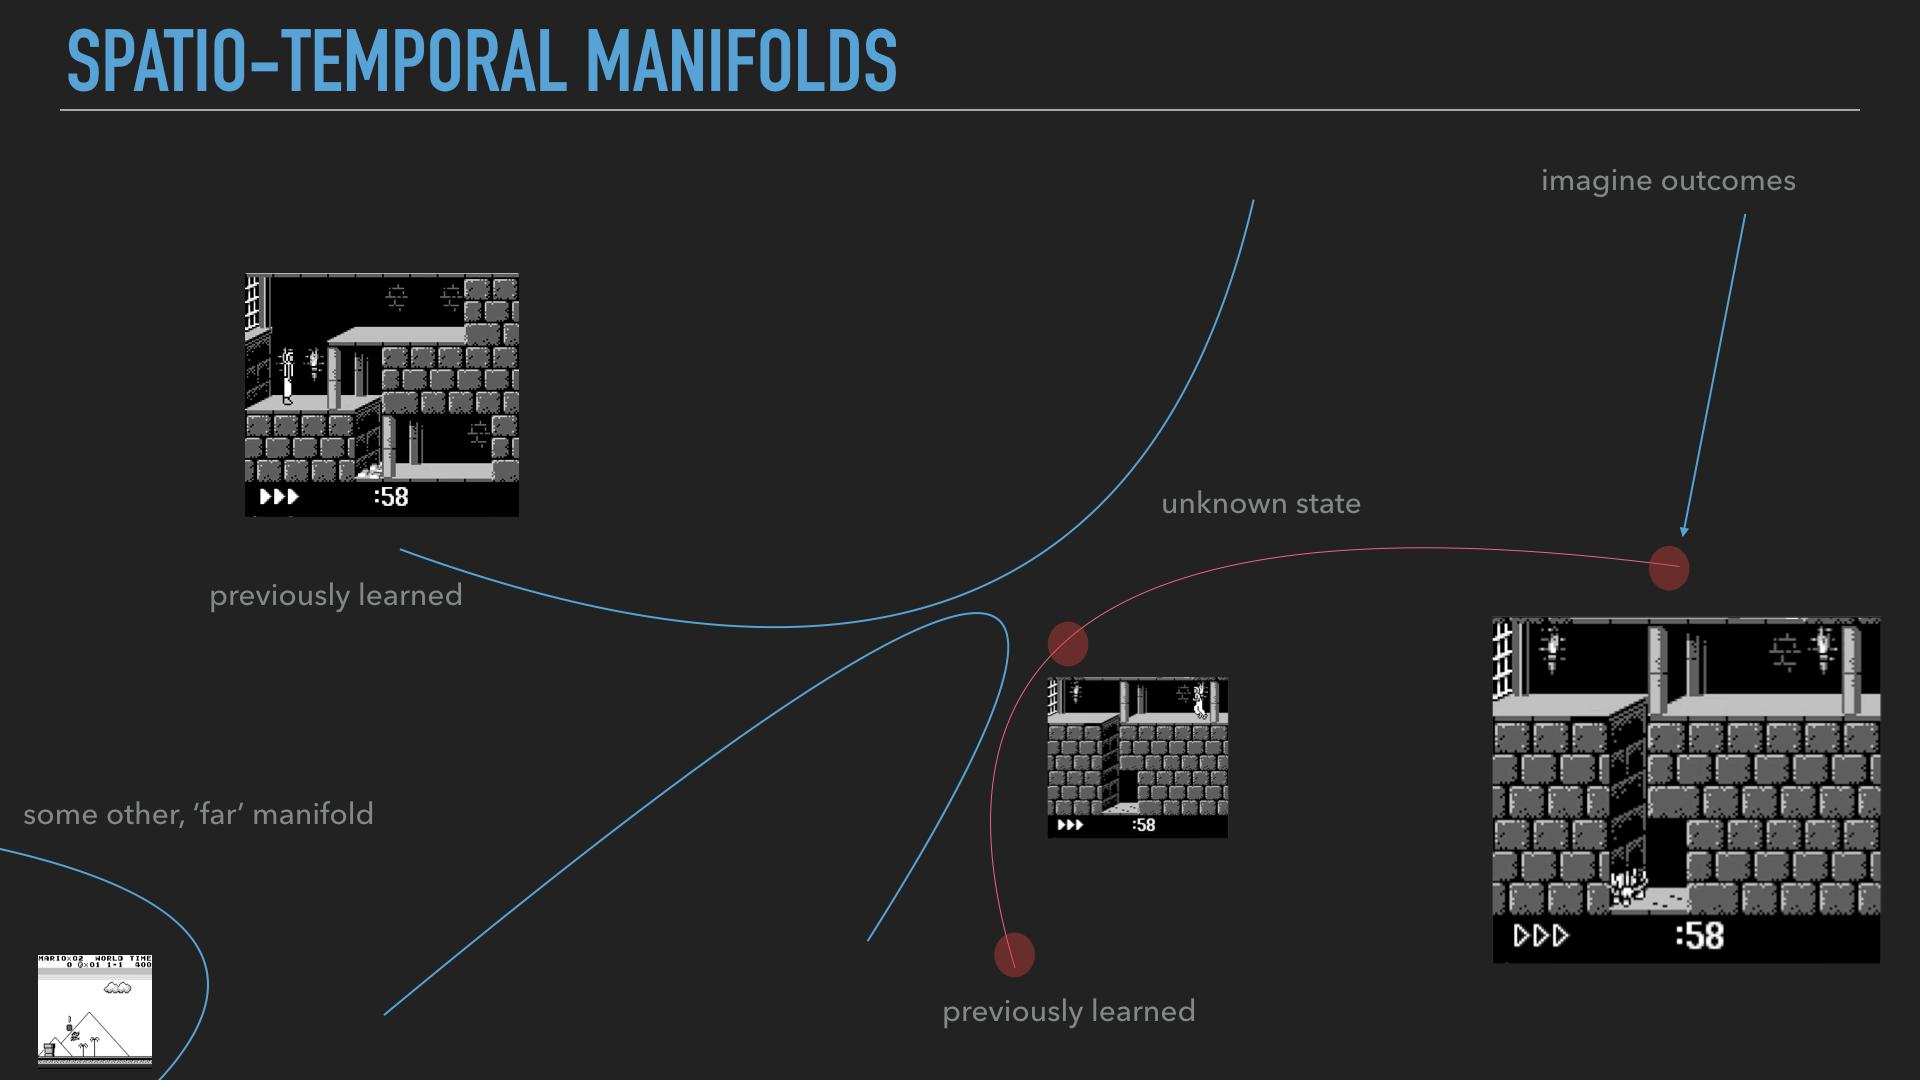 learning manifolds